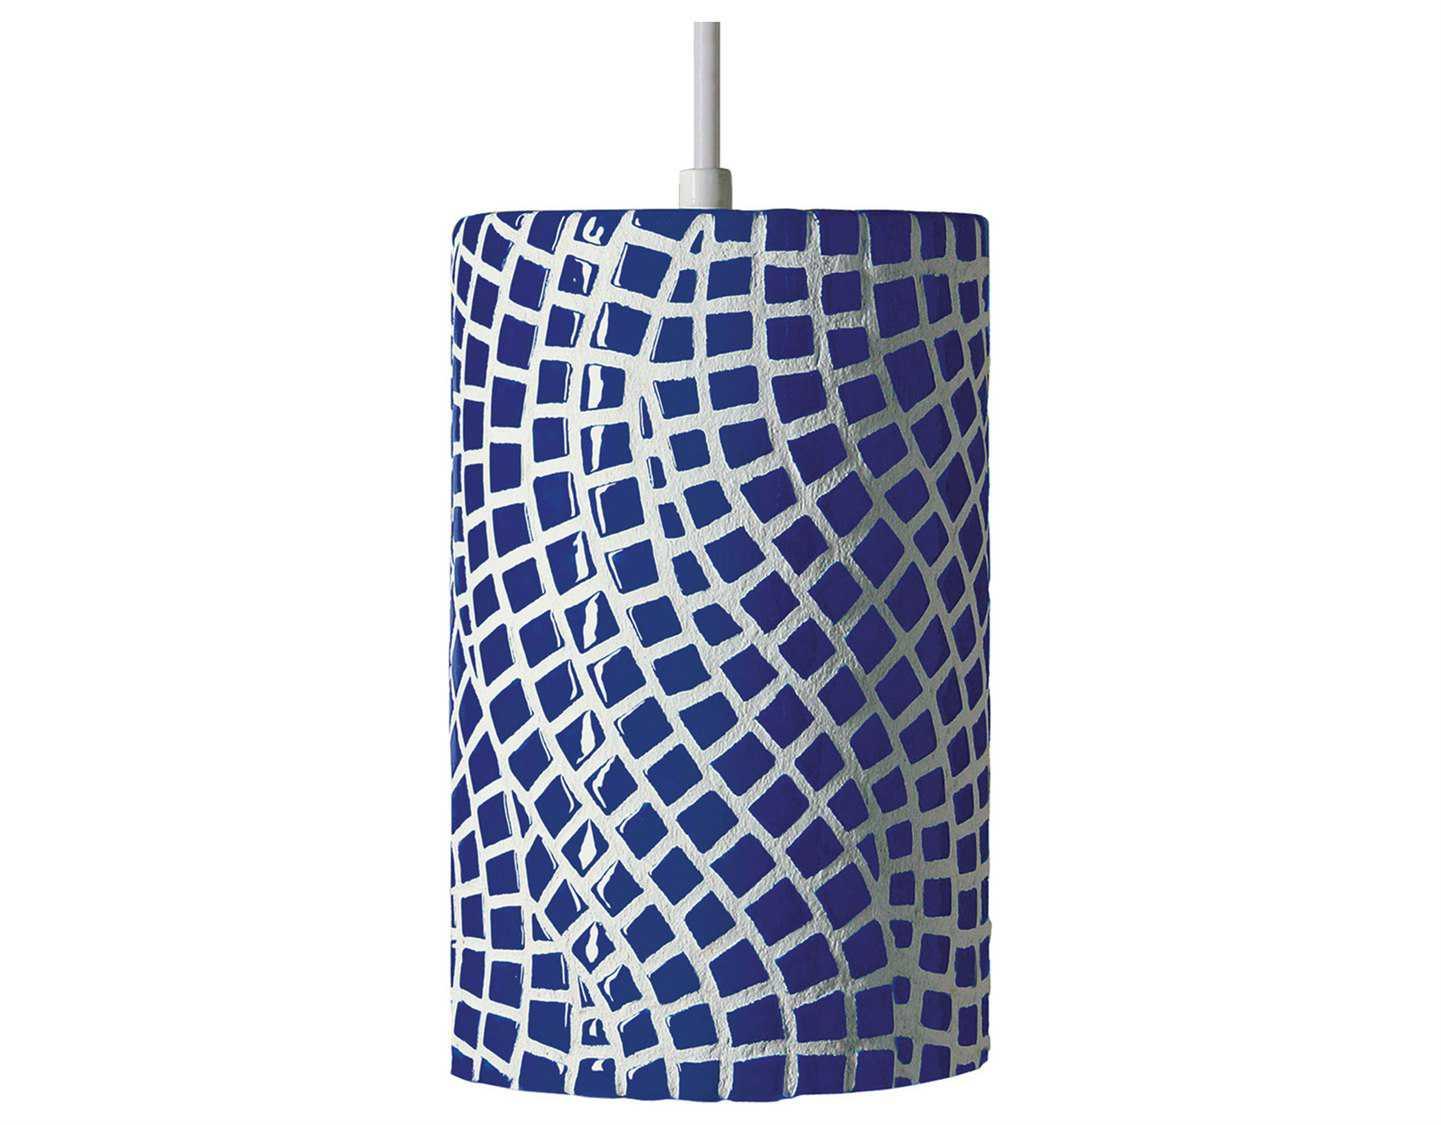 a19 lighting mosaic channels cobalt blue pendant pm20302 cb. Black Bedroom Furniture Sets. Home Design Ideas